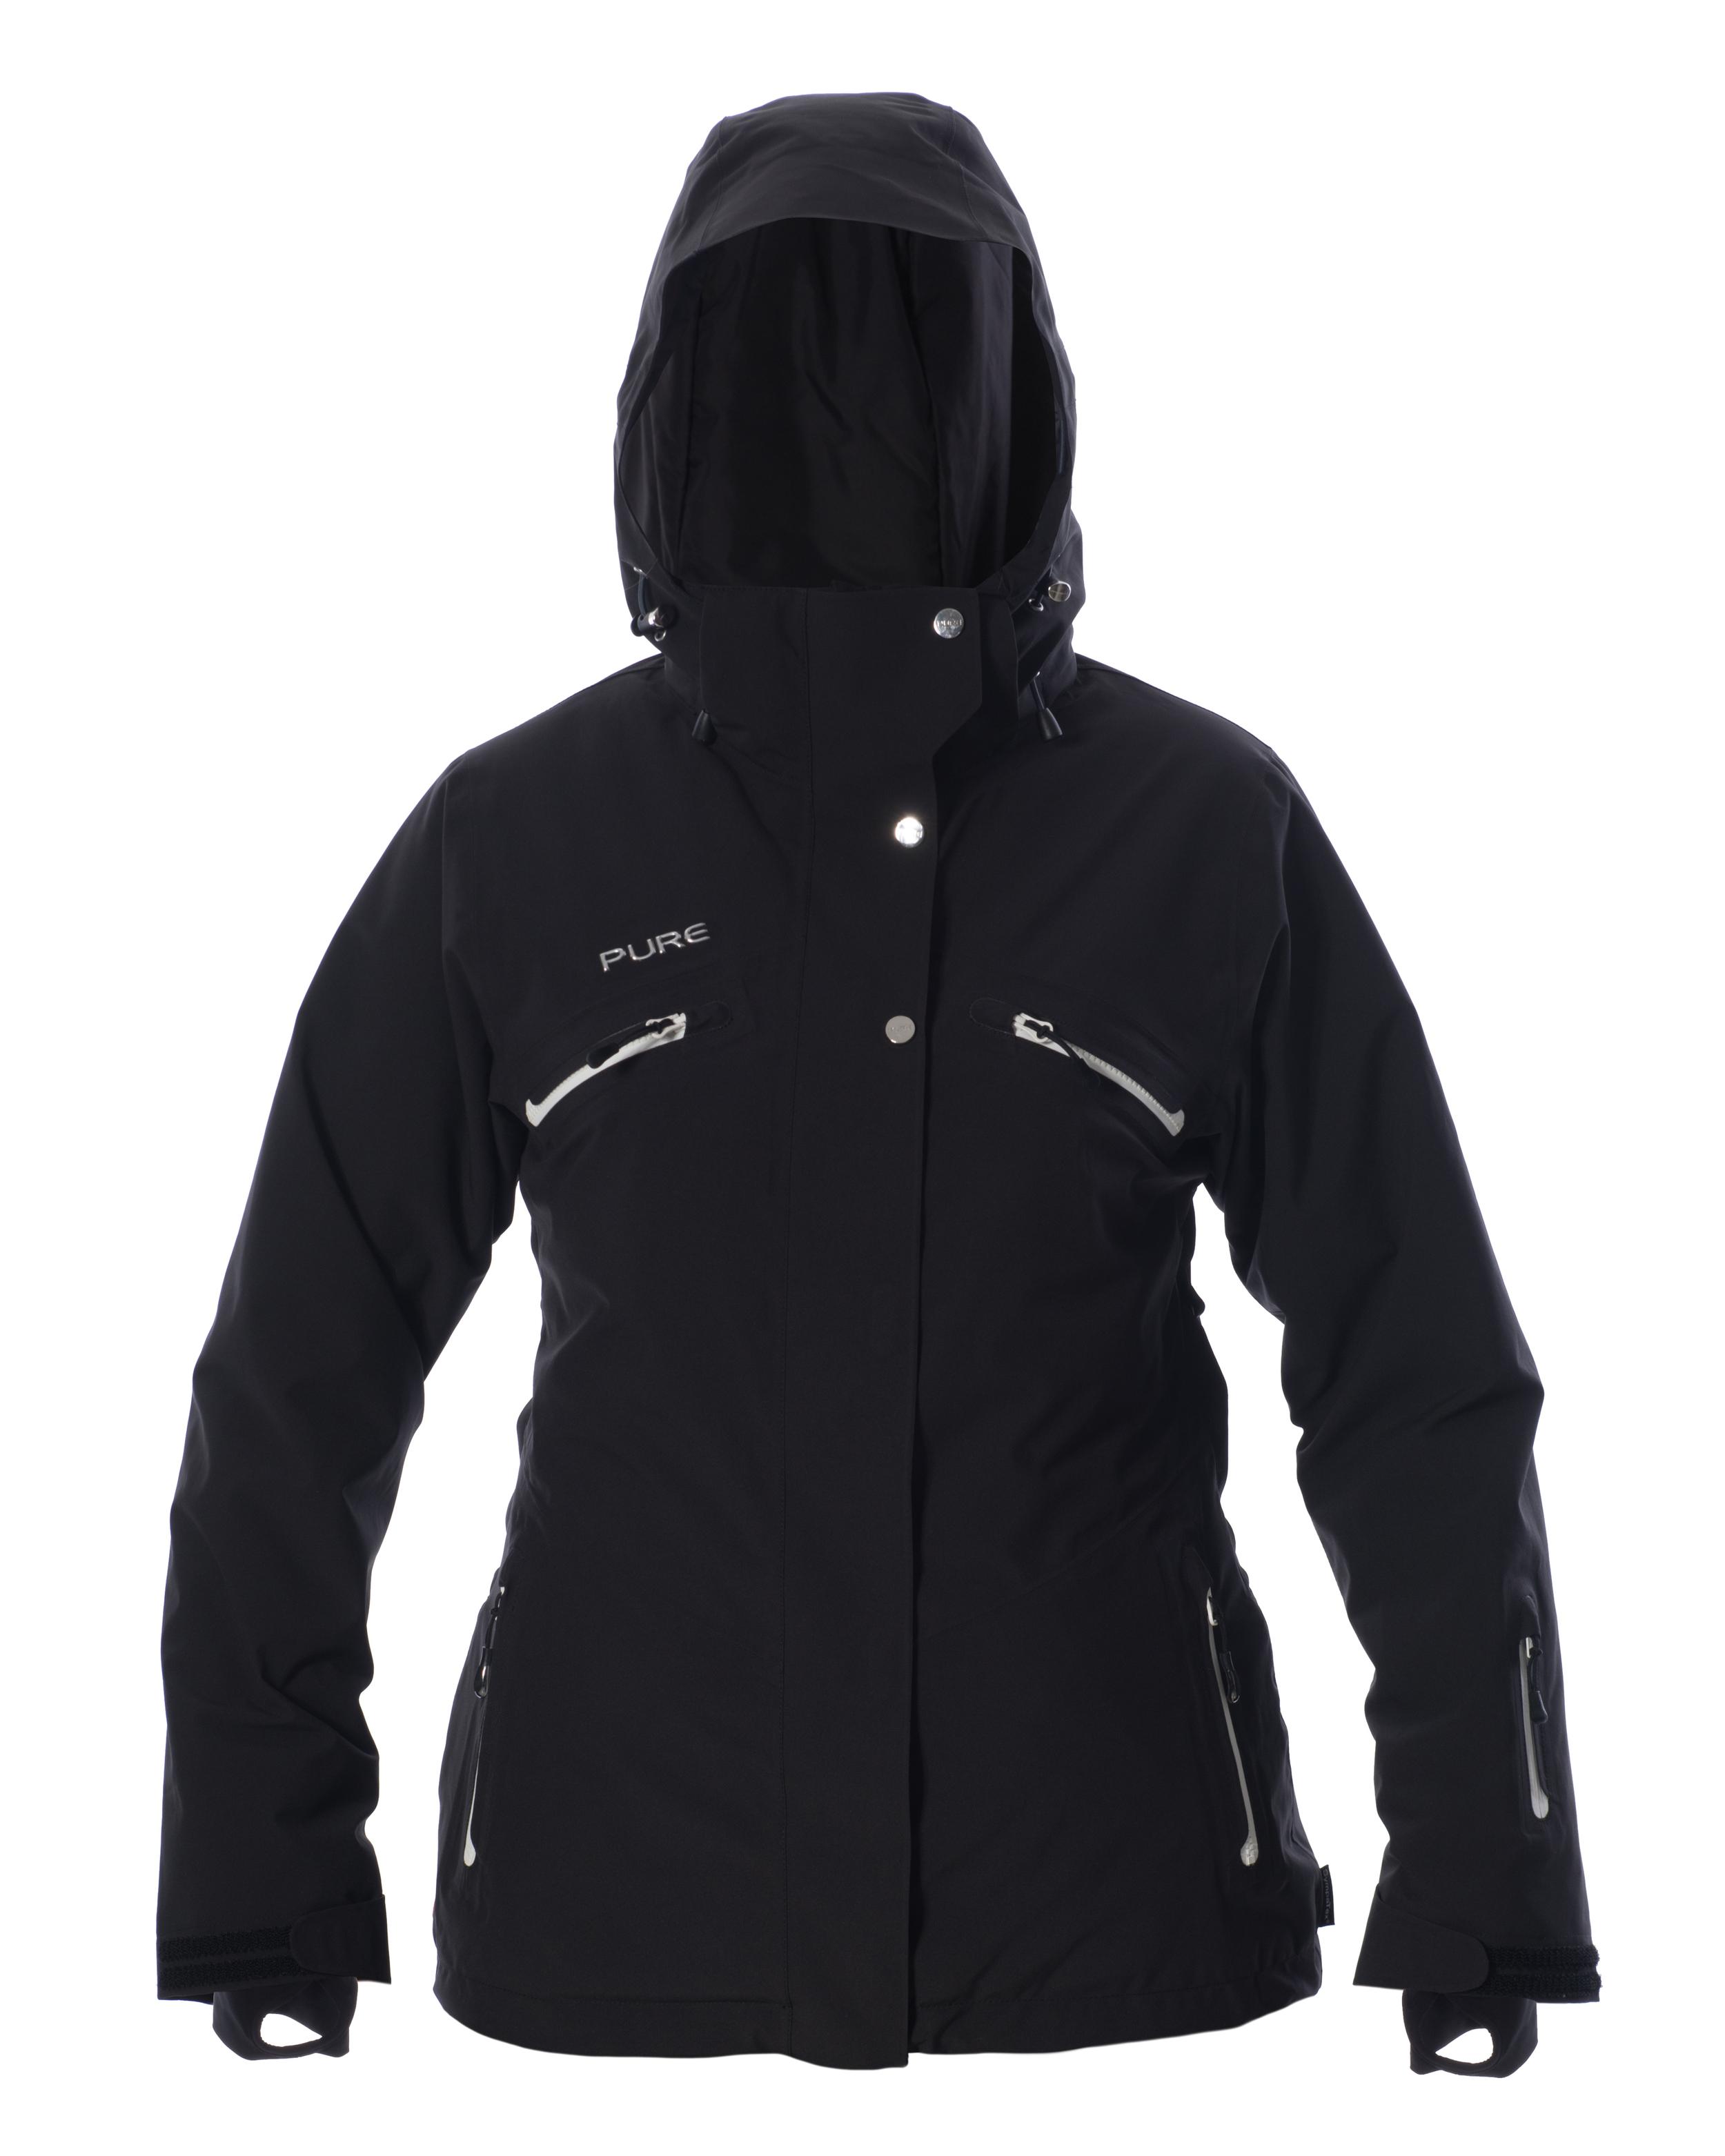 Cortina Women's Pure Snow - Black